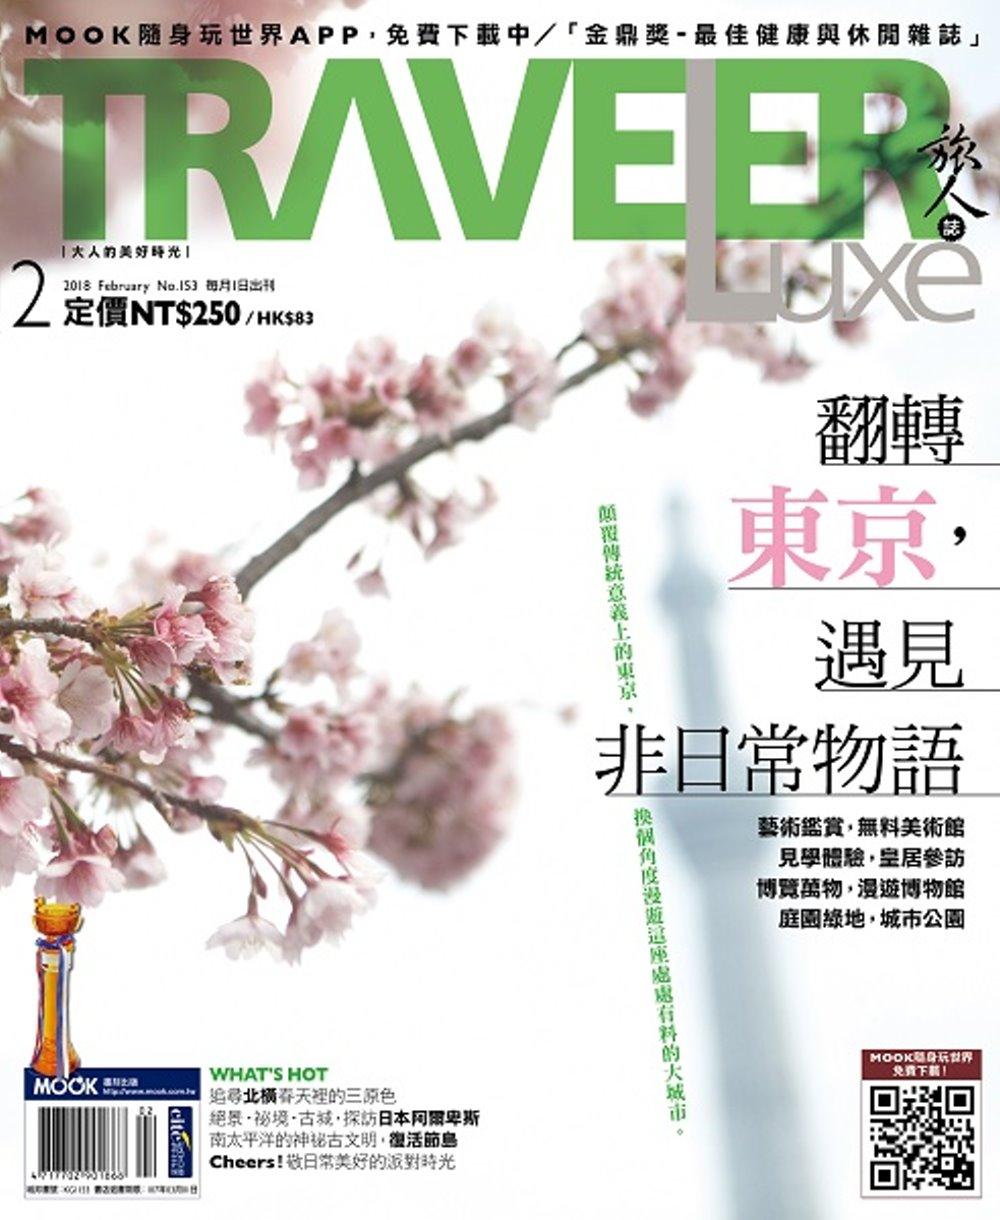 TRAVELER LUXE 旅人誌 2月號/2018 第153期